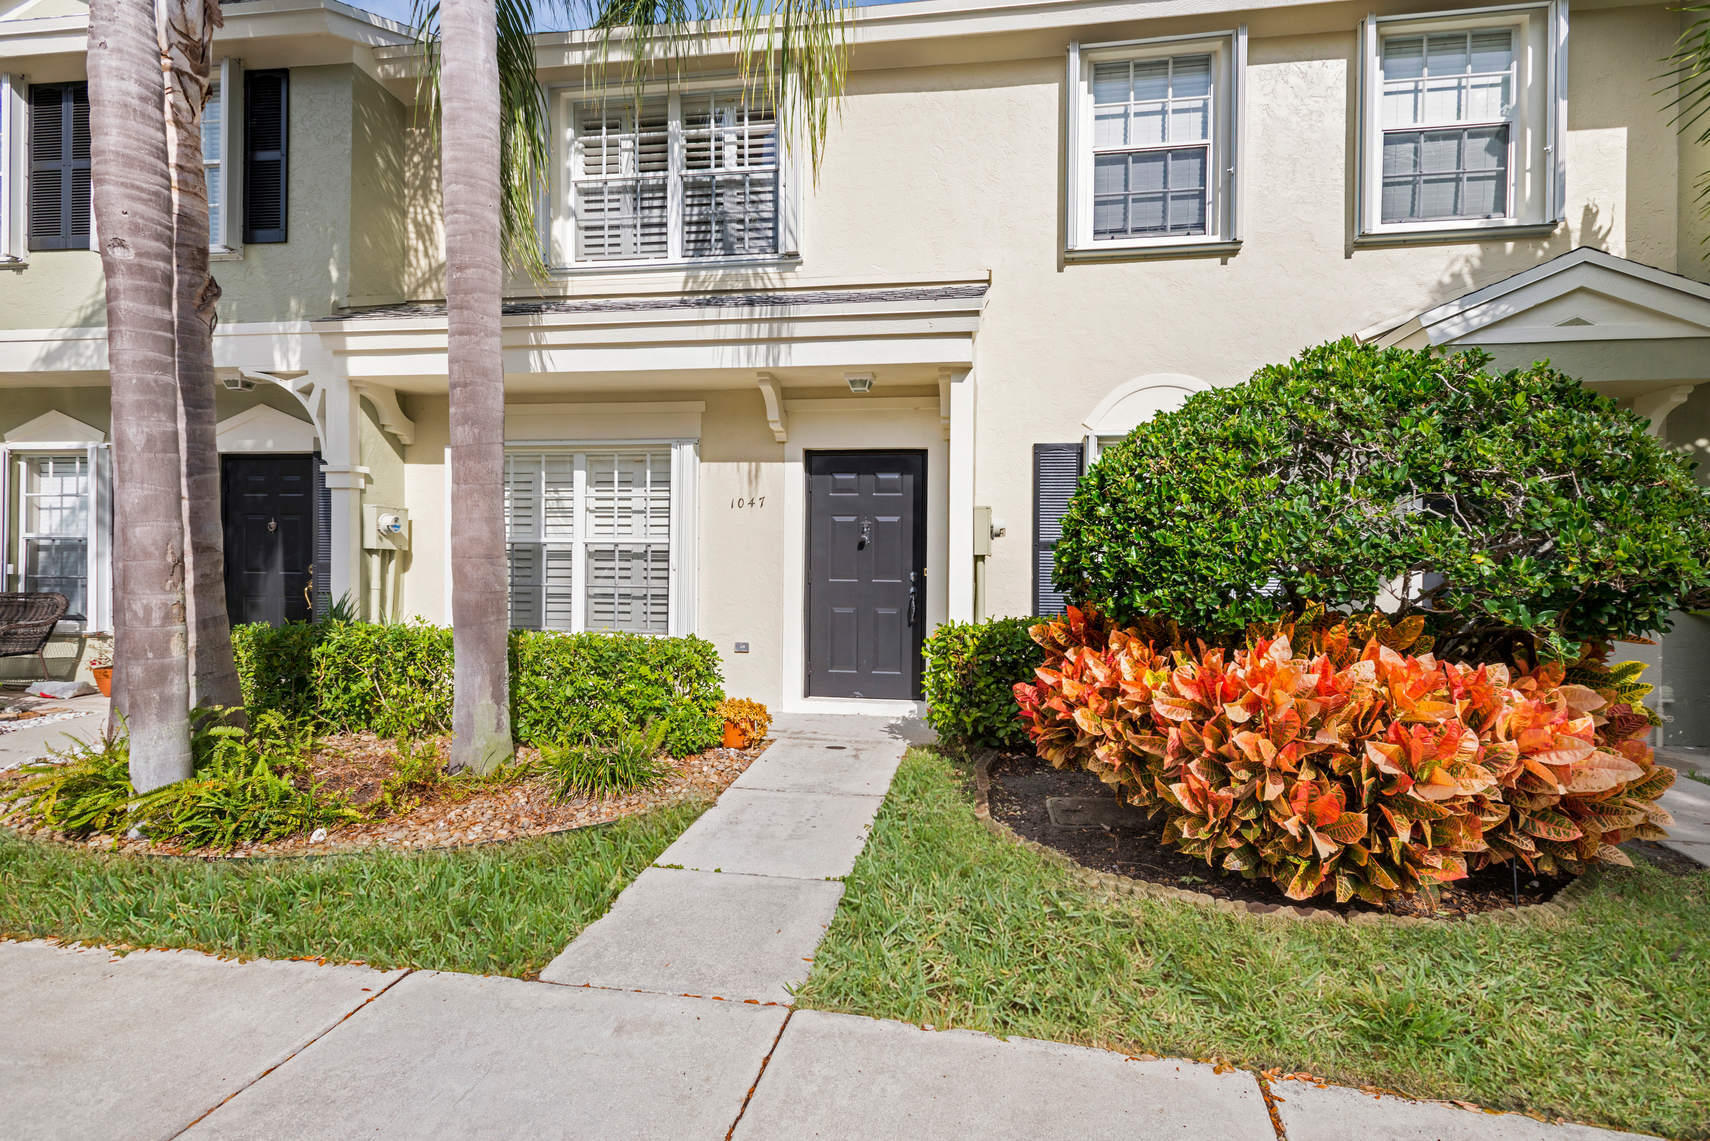 1047 Kokomo Key Lane, Delray Beach, Florida 33483, 2 Bedrooms Bedrooms, ,1.1 BathroomsBathrooms,Townhouse,For Sale,Kokomo Key,Kokomo Key,RX-10492958